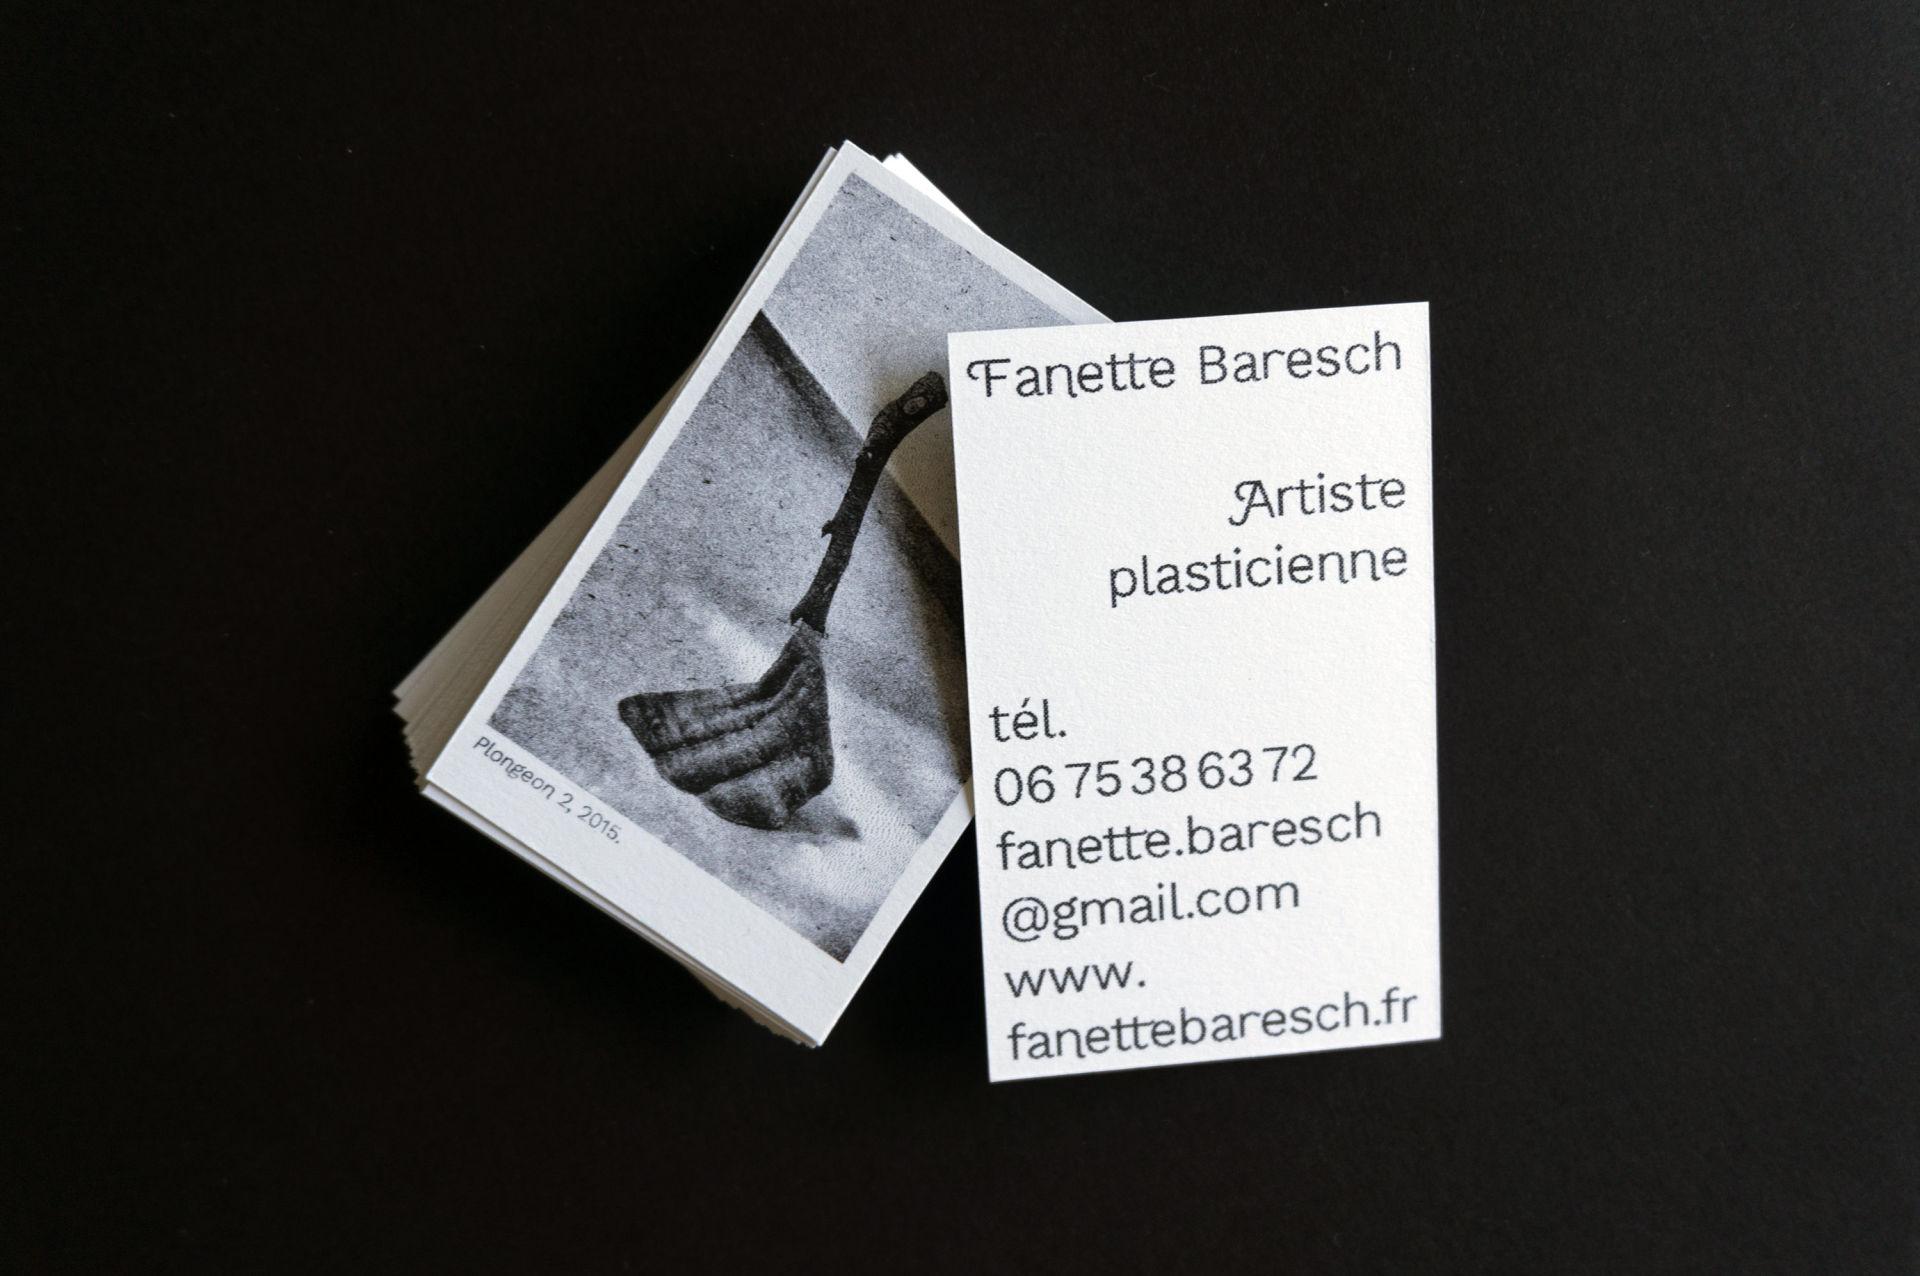 Studio Samuel Gadea Fanette Baresch